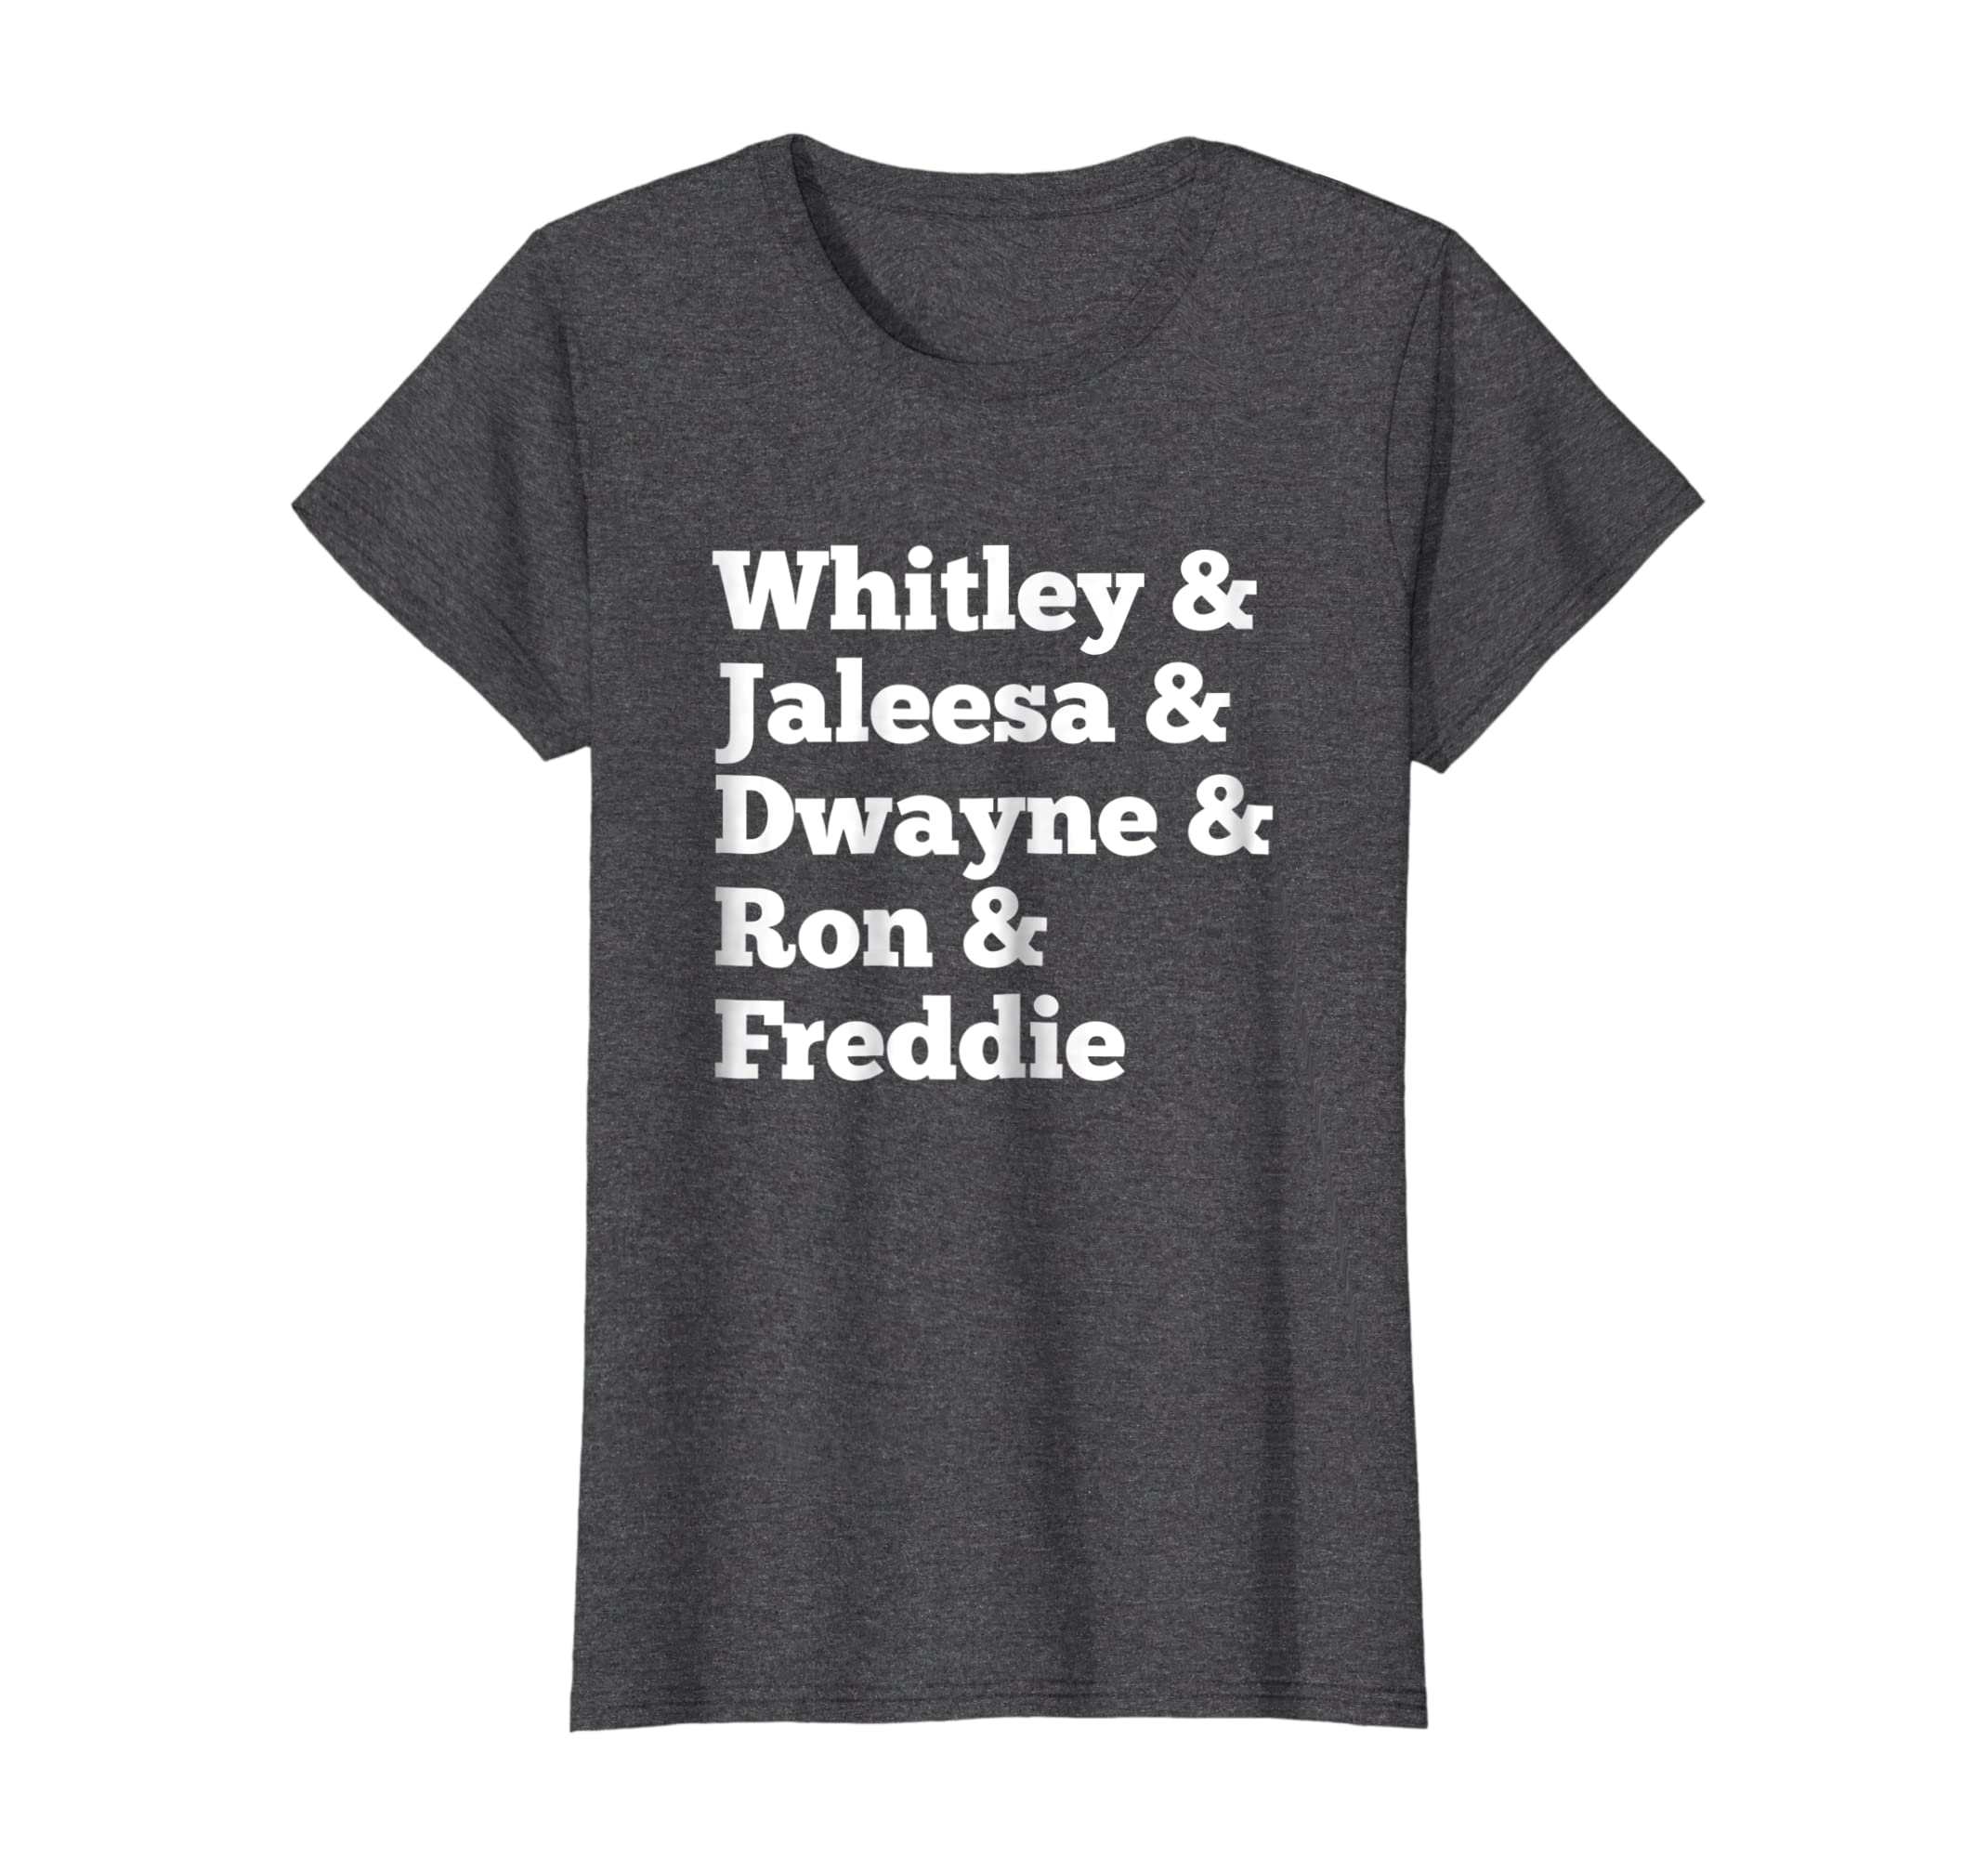 Whitley Jaleesa Dwayne Ron & Freddie Fan T Shirt-Teechatpro